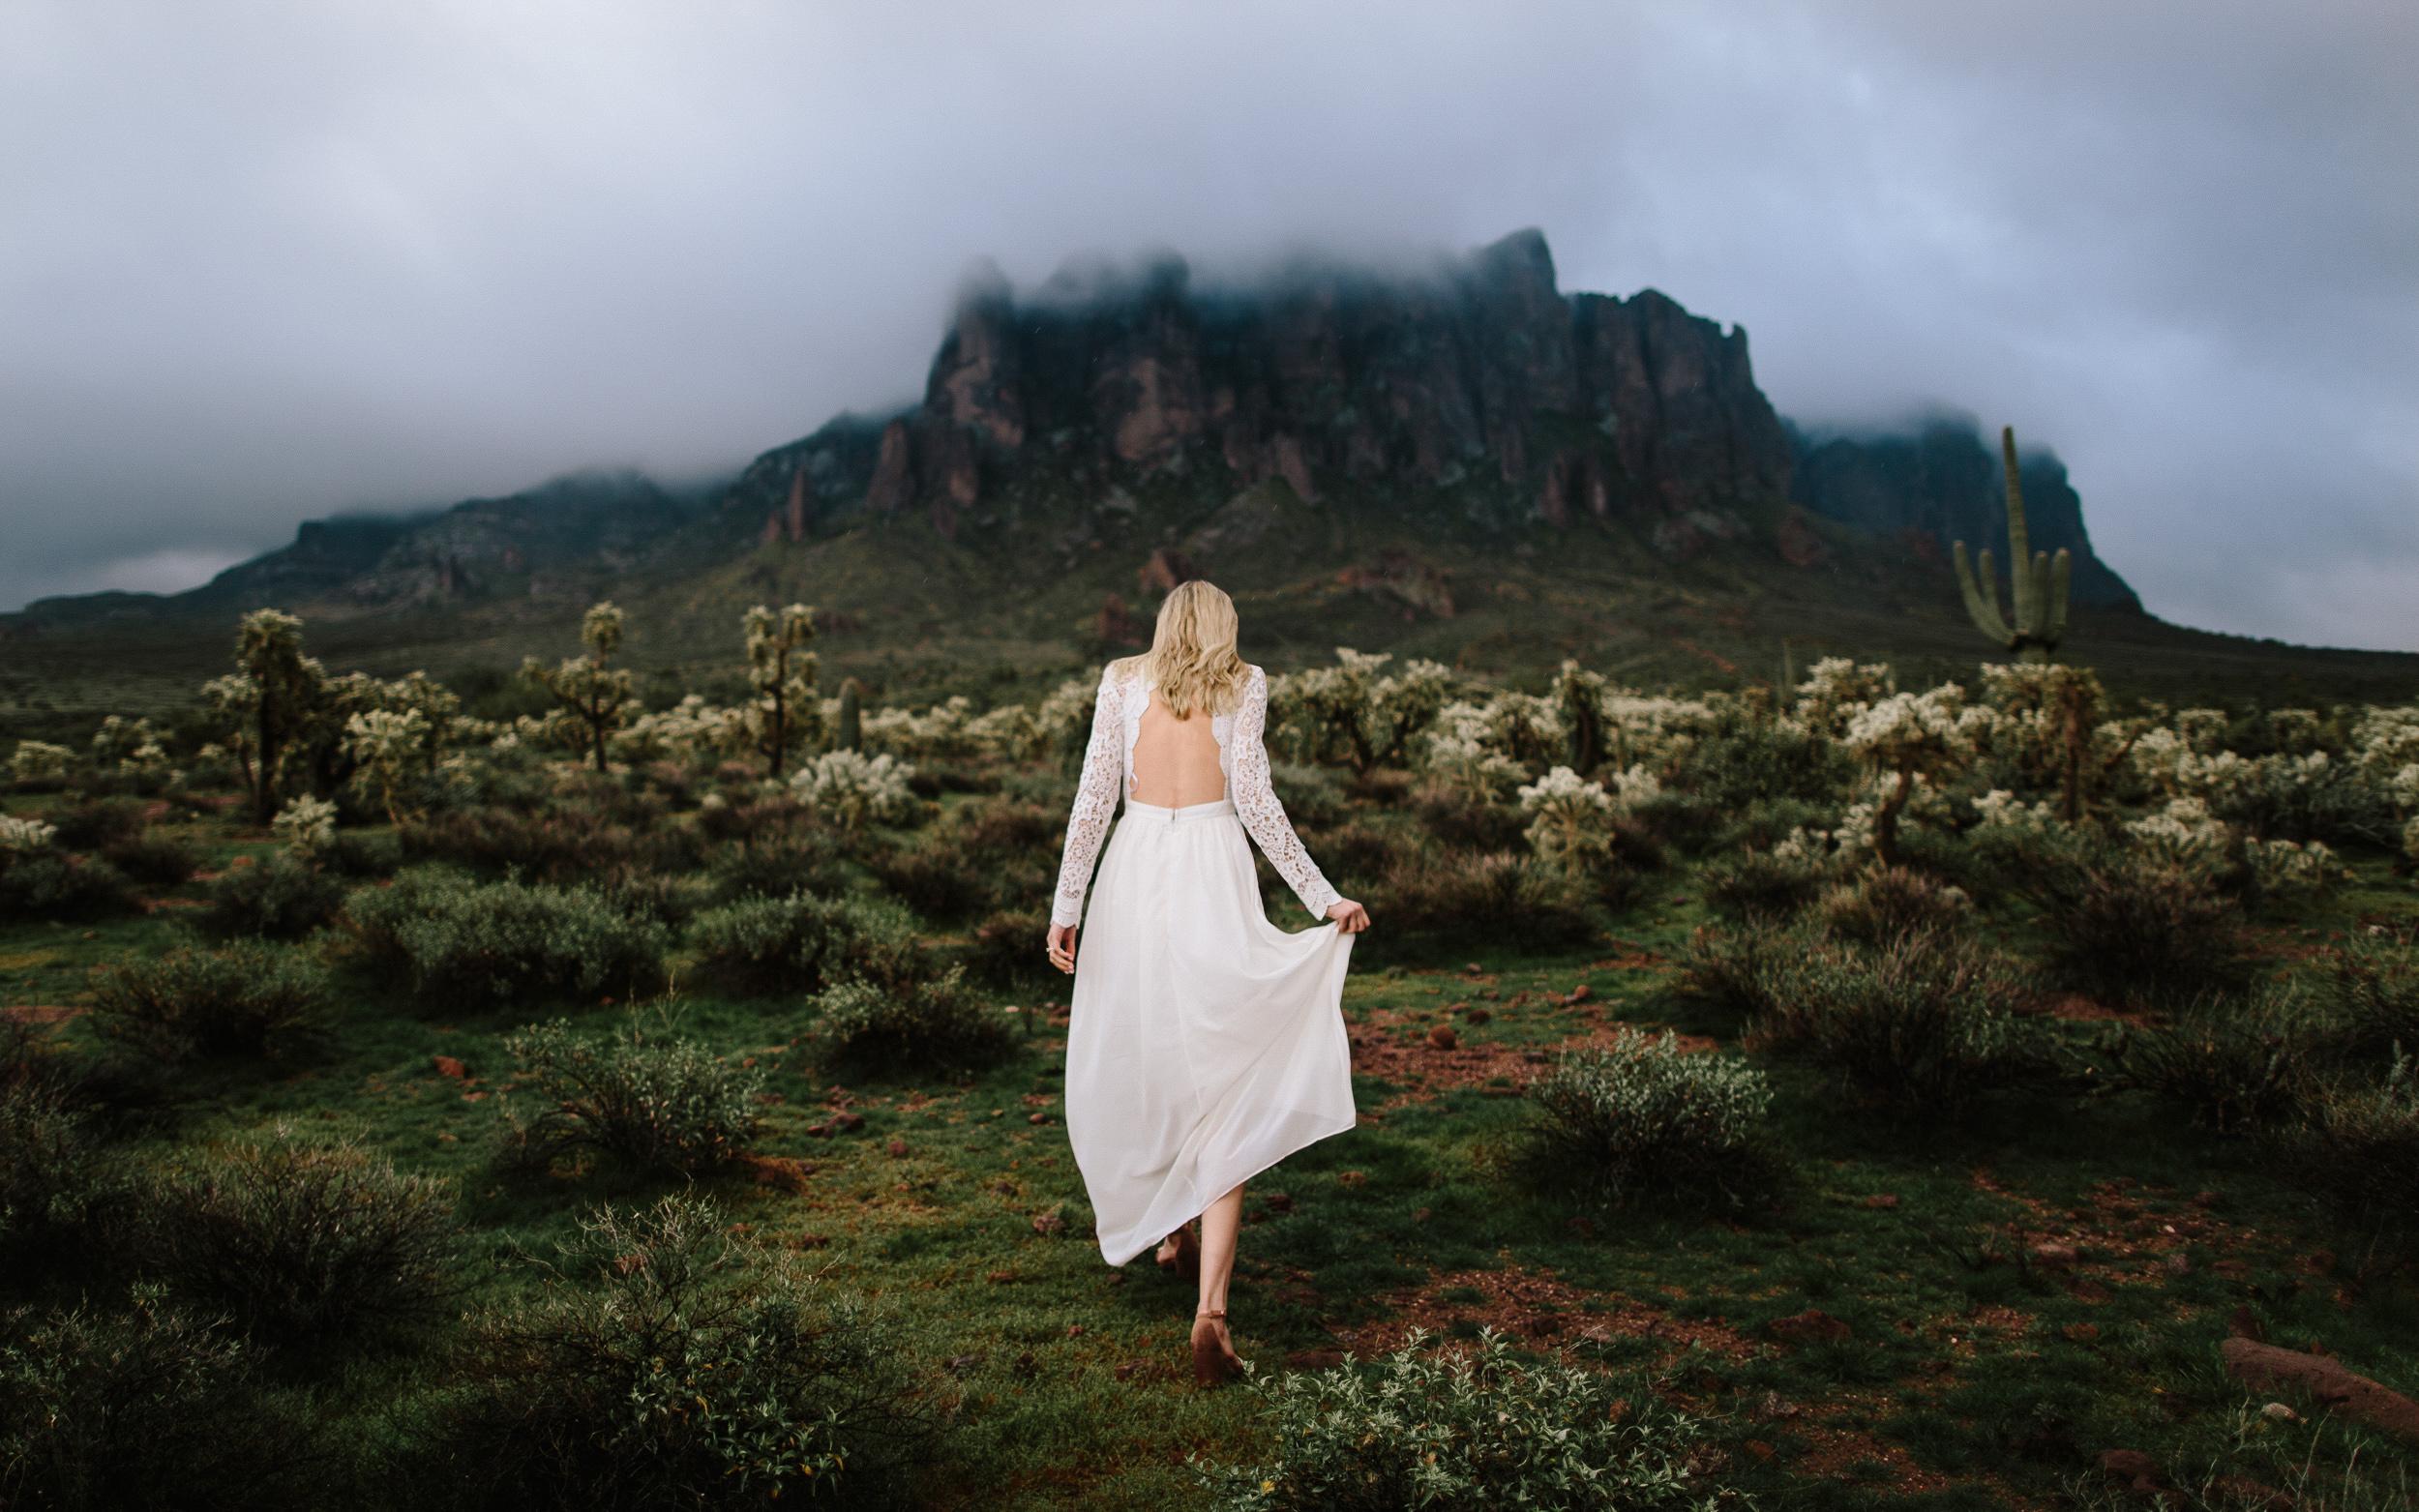 phoenix-mesa-elopement-wedding-photographer-lost-dutchman-state-park-superstitious-mountains-18.jpg